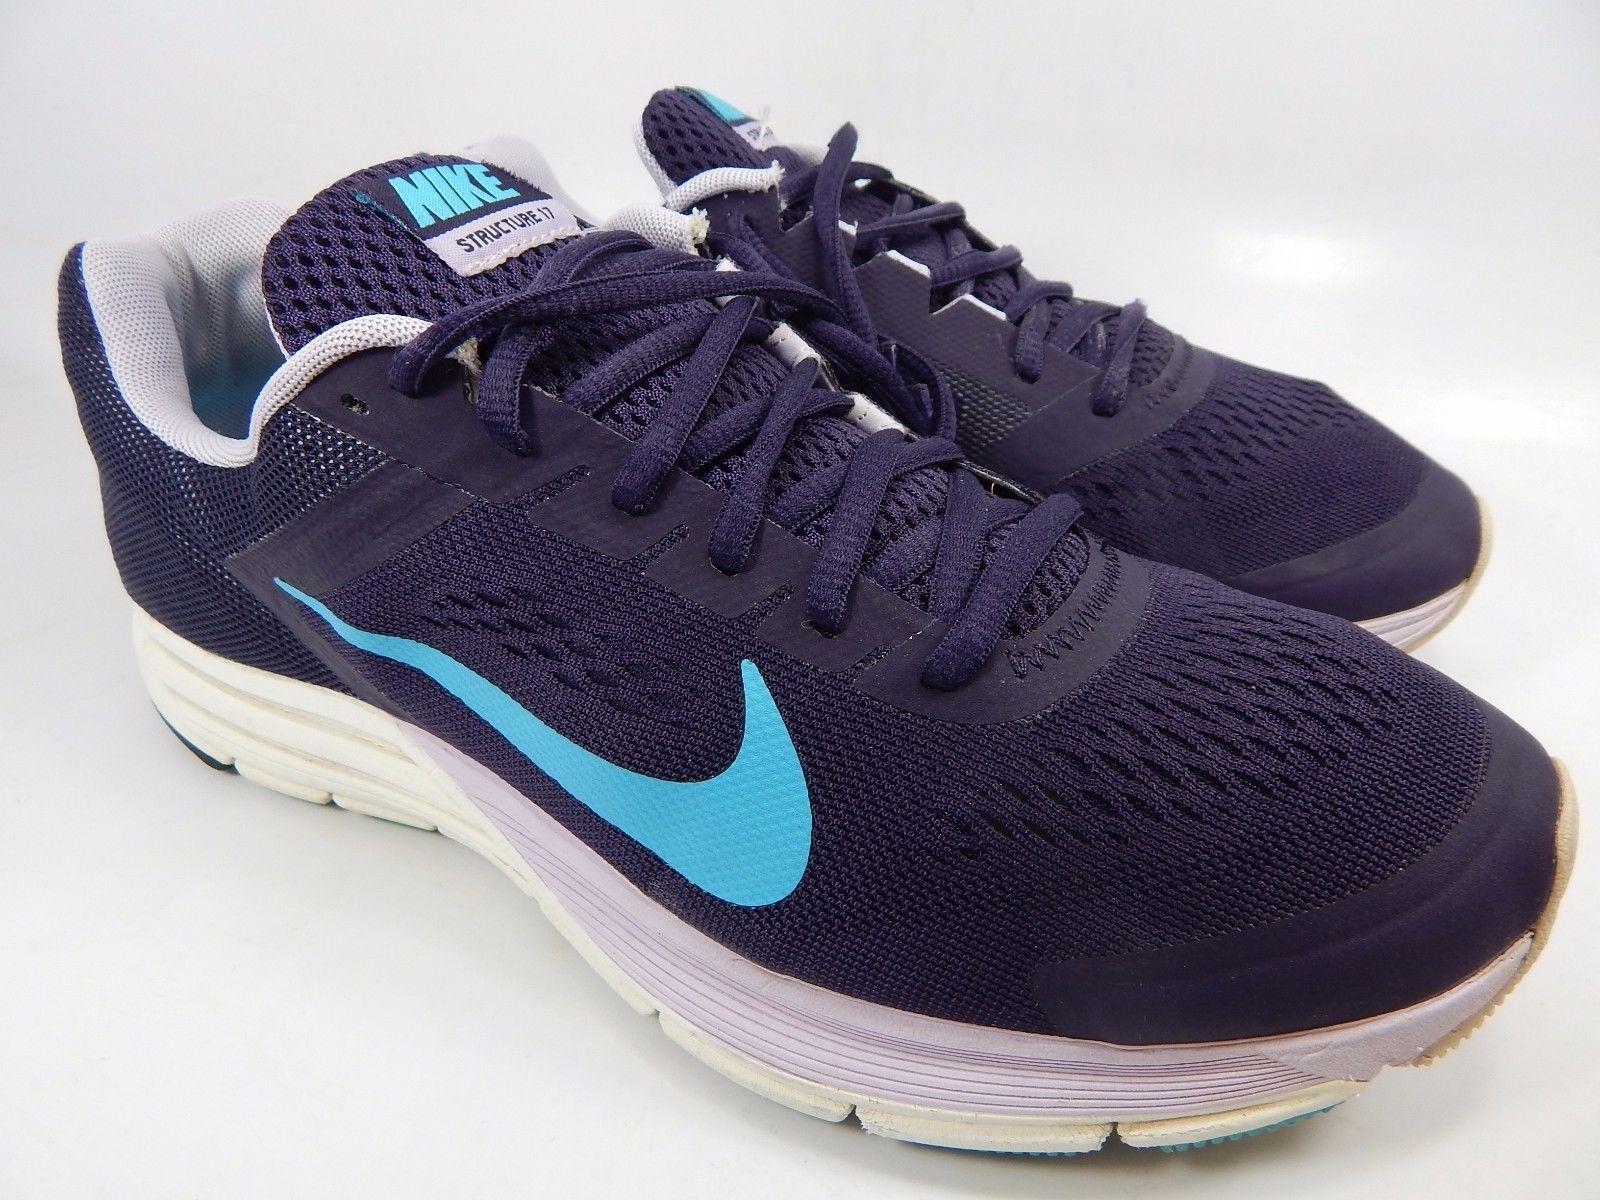 Nike Zoom Structure+ 17  Women's Running Shoes Size US 10 M (B) EU 42 615588-545